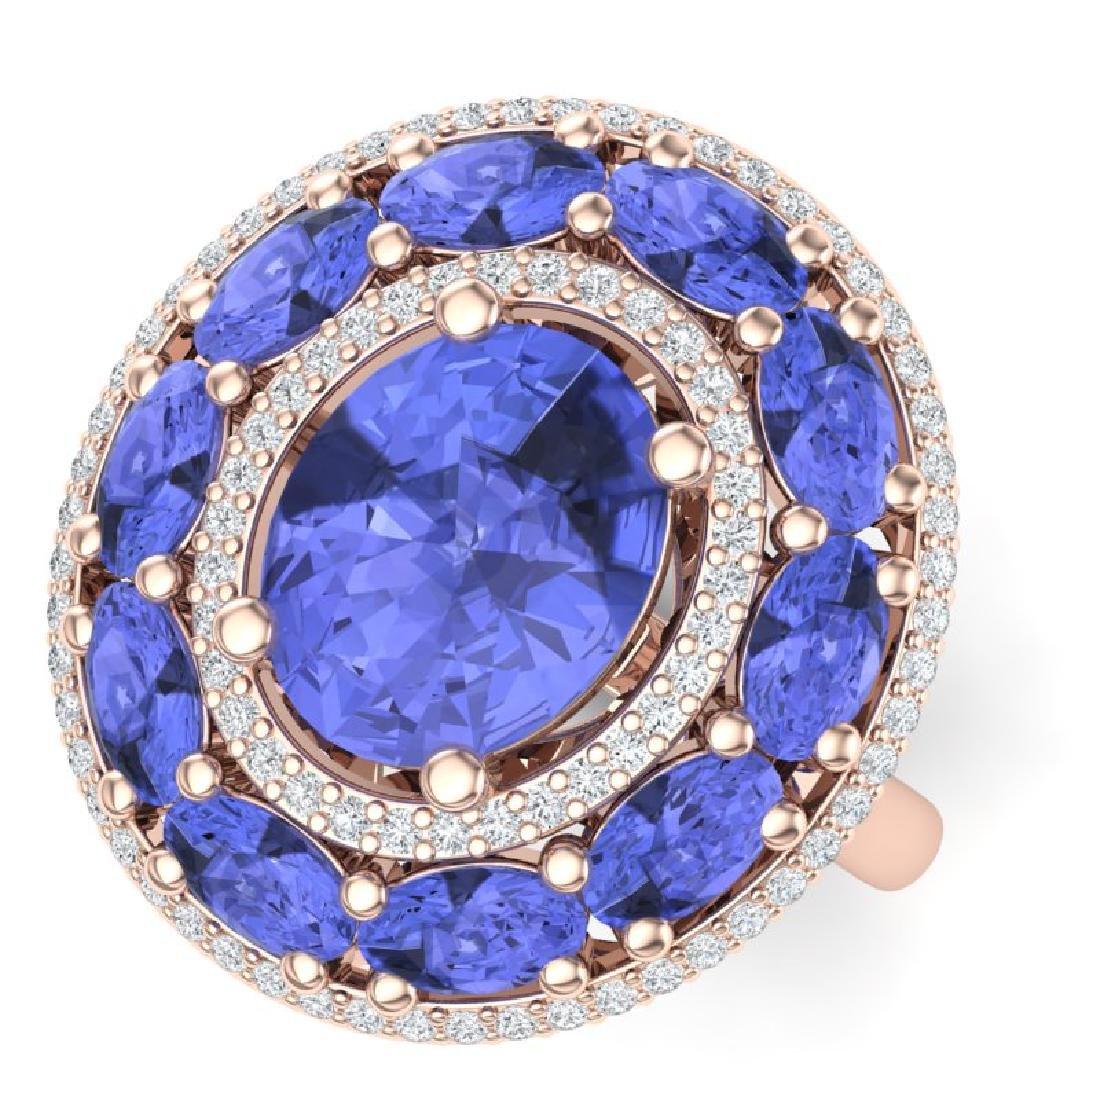 8.49 CTW Royalty Tanzanite & VS Diamond Ring 18K Rose